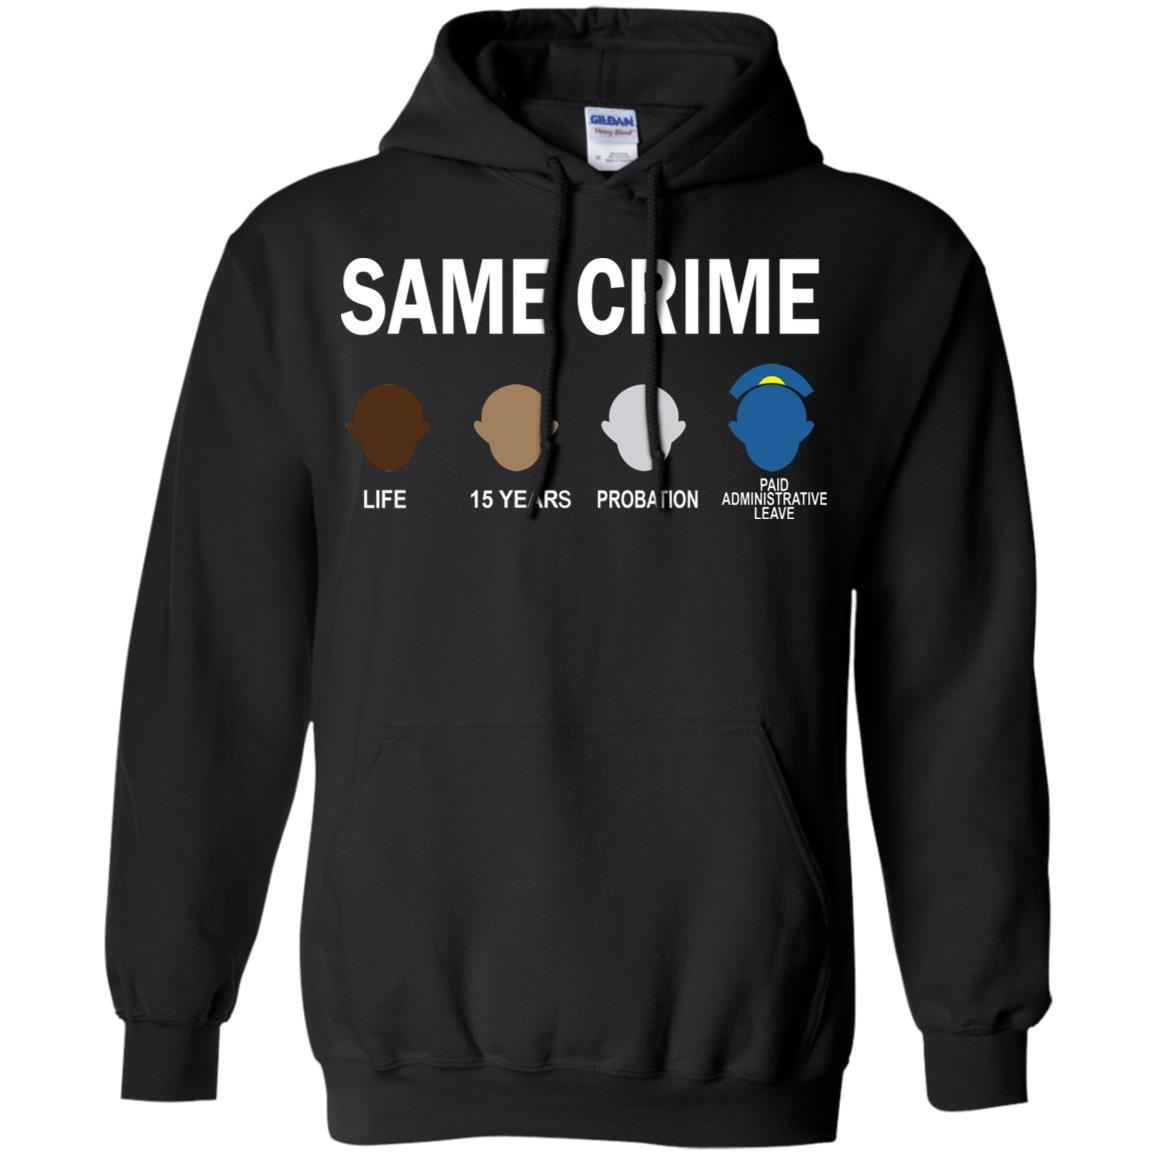 a77deba1733 Colin Kaepernick Same Crime hoodie